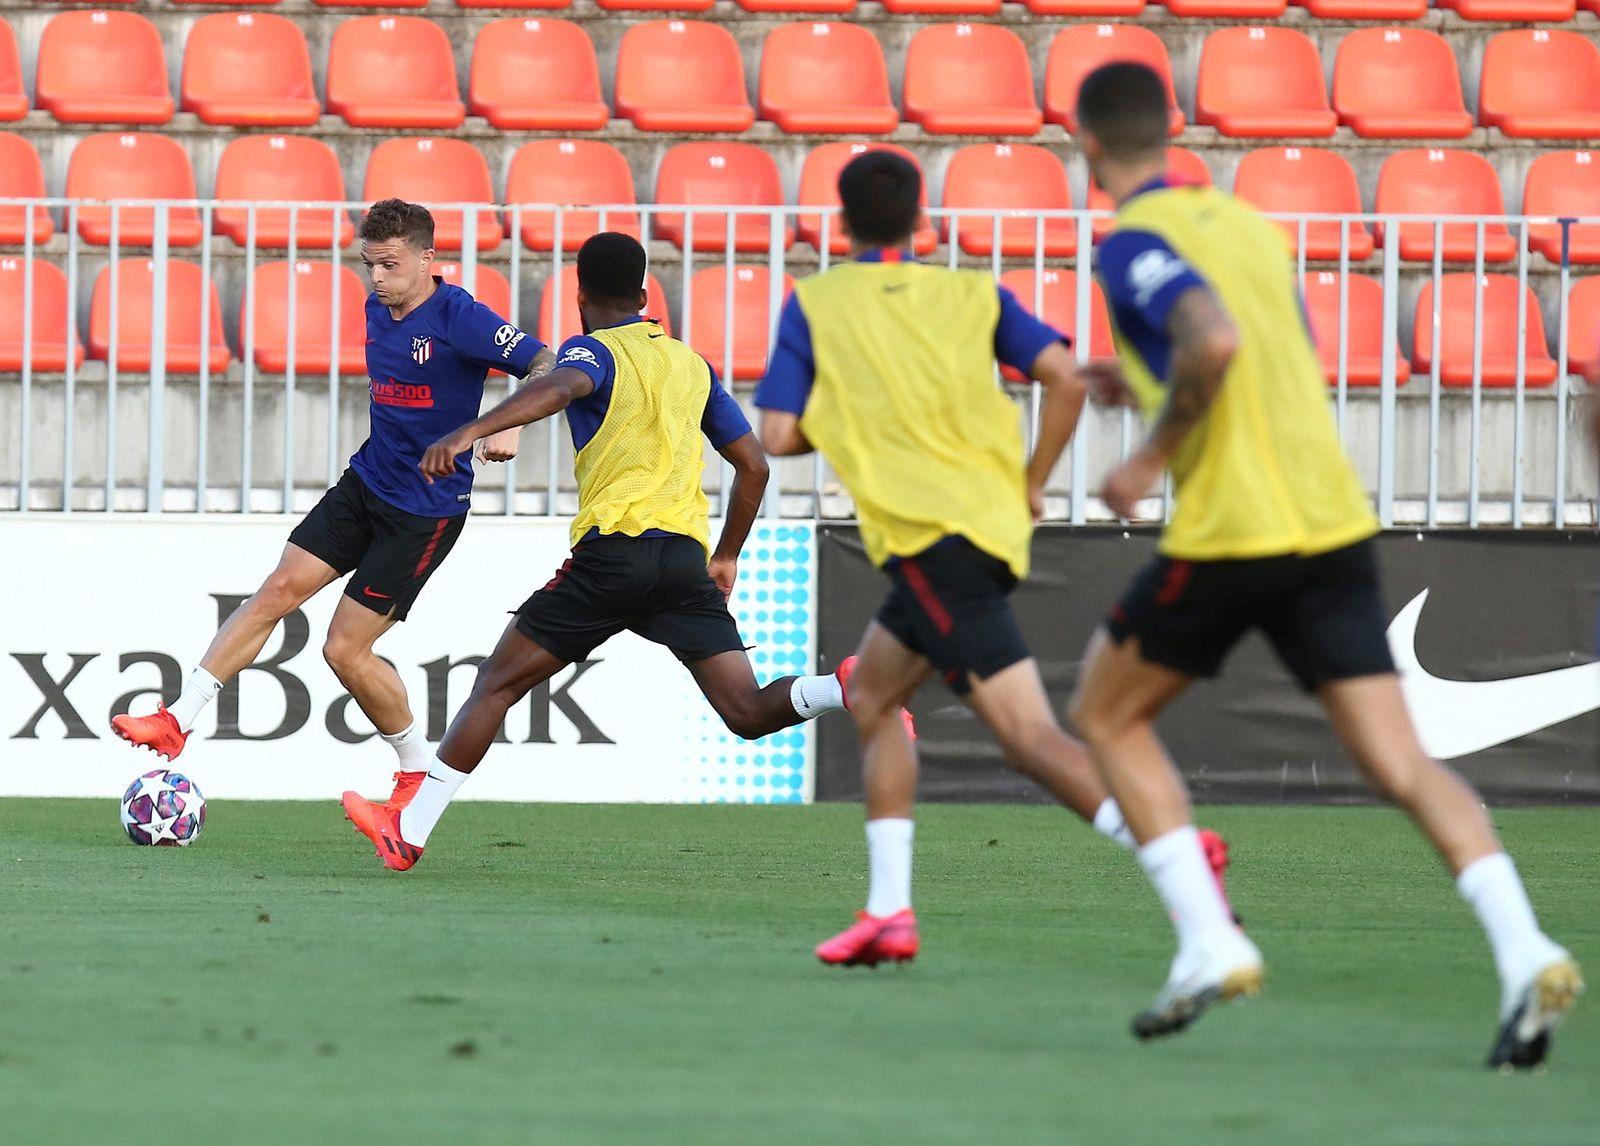 Atletico Madrid training session, Spain - 03 Aug 2020